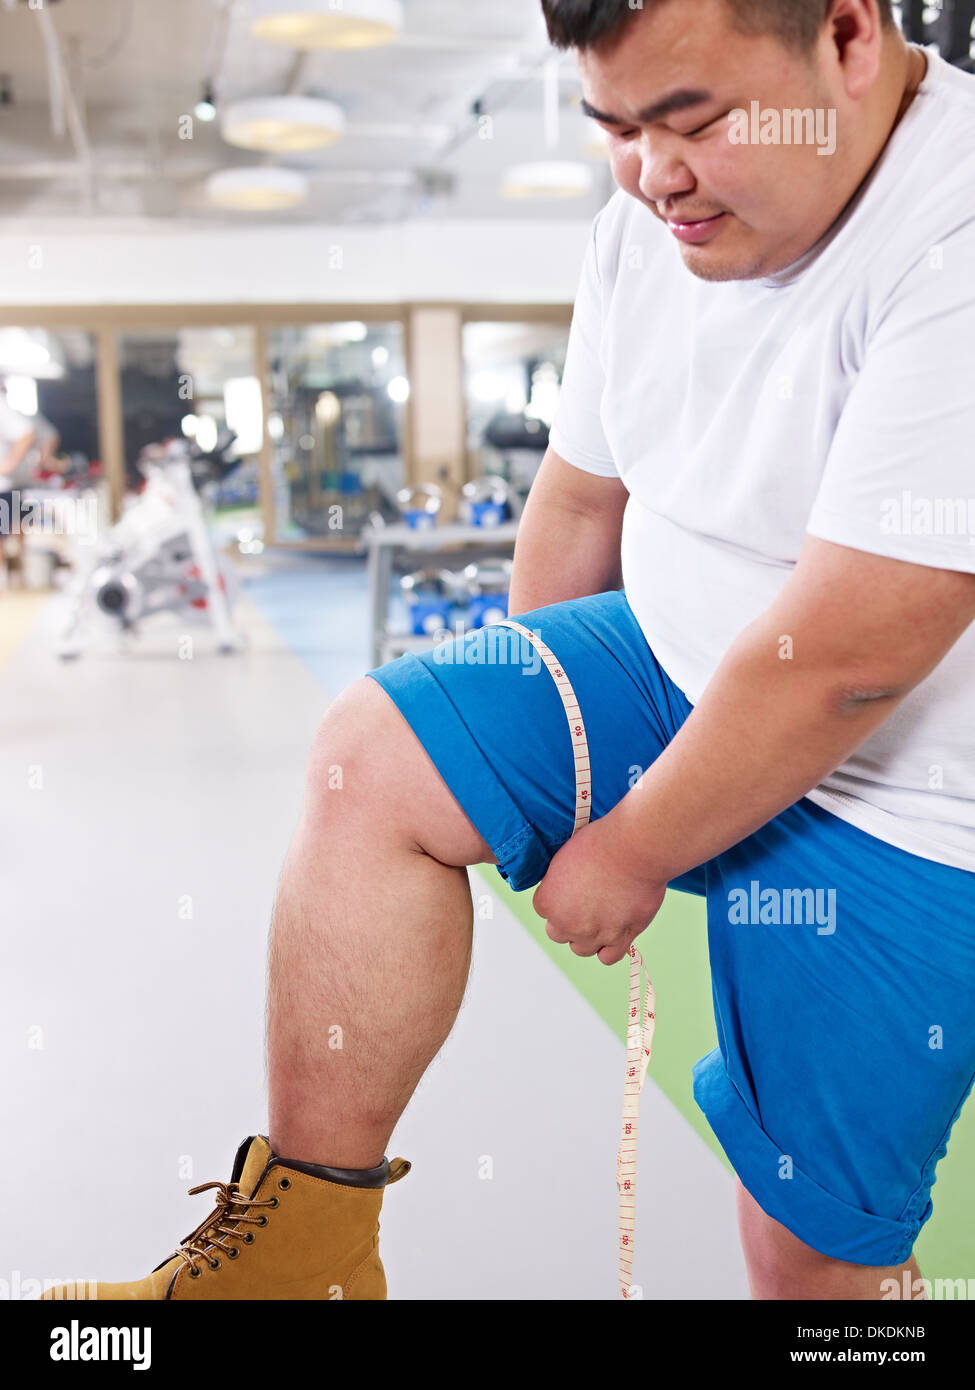 overweight man measuring leg size - Stock Image